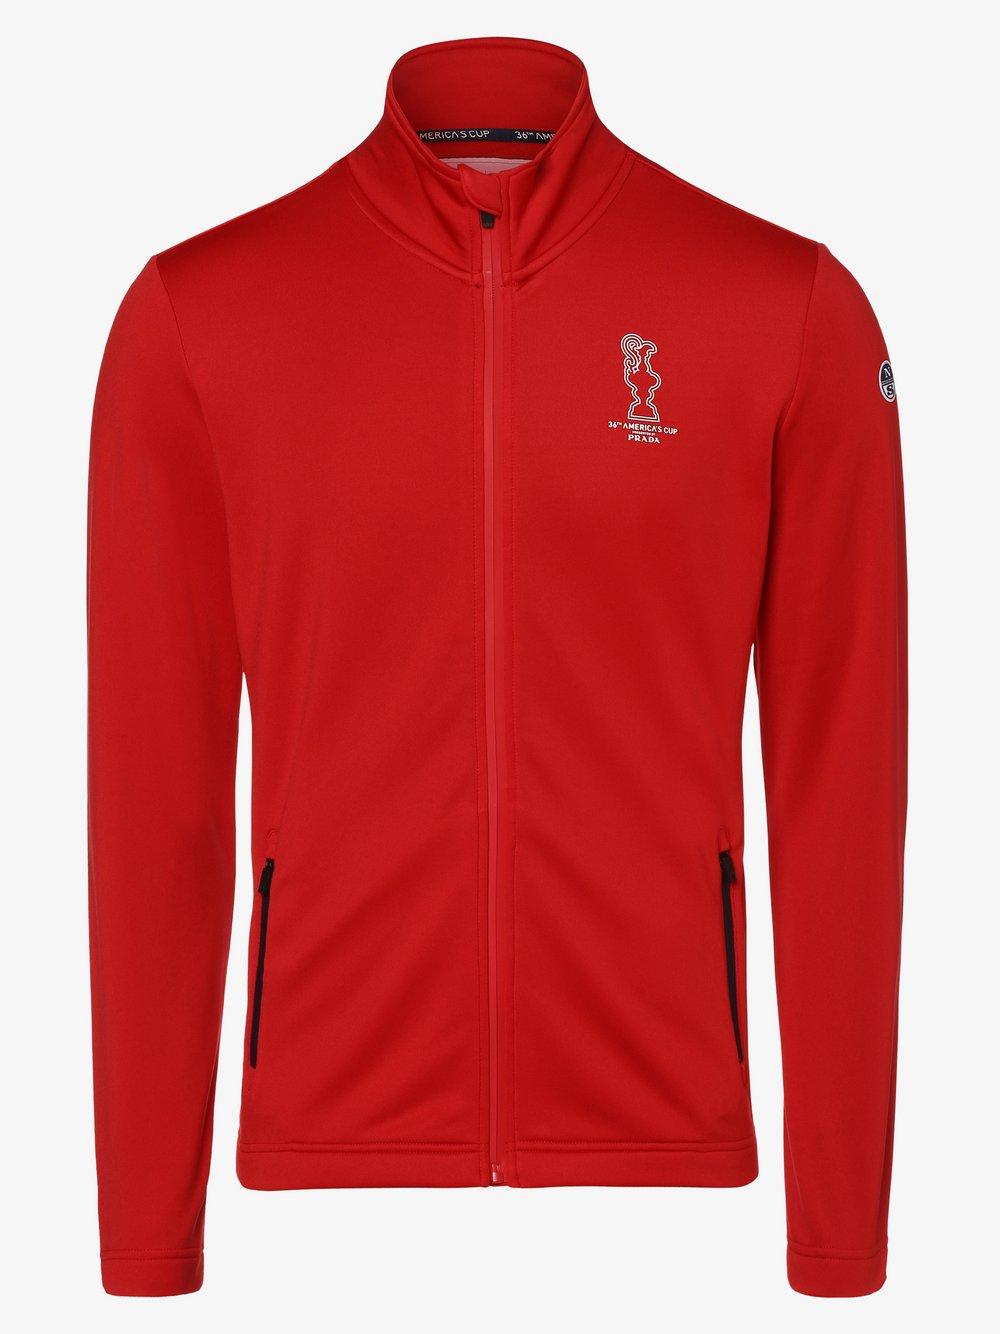 North Sails – Męska bluza nierozpinana, czerwony Van Graaf 464457-0001-09995